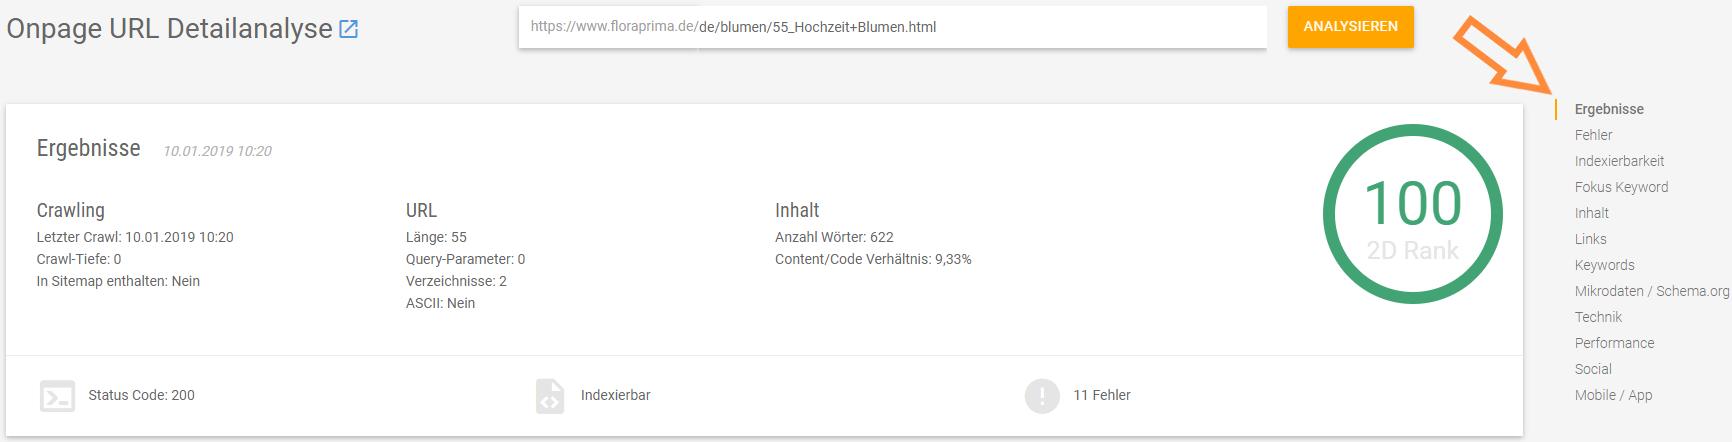 Screenshot XOVI Suite Onpage URL Detailanalyse